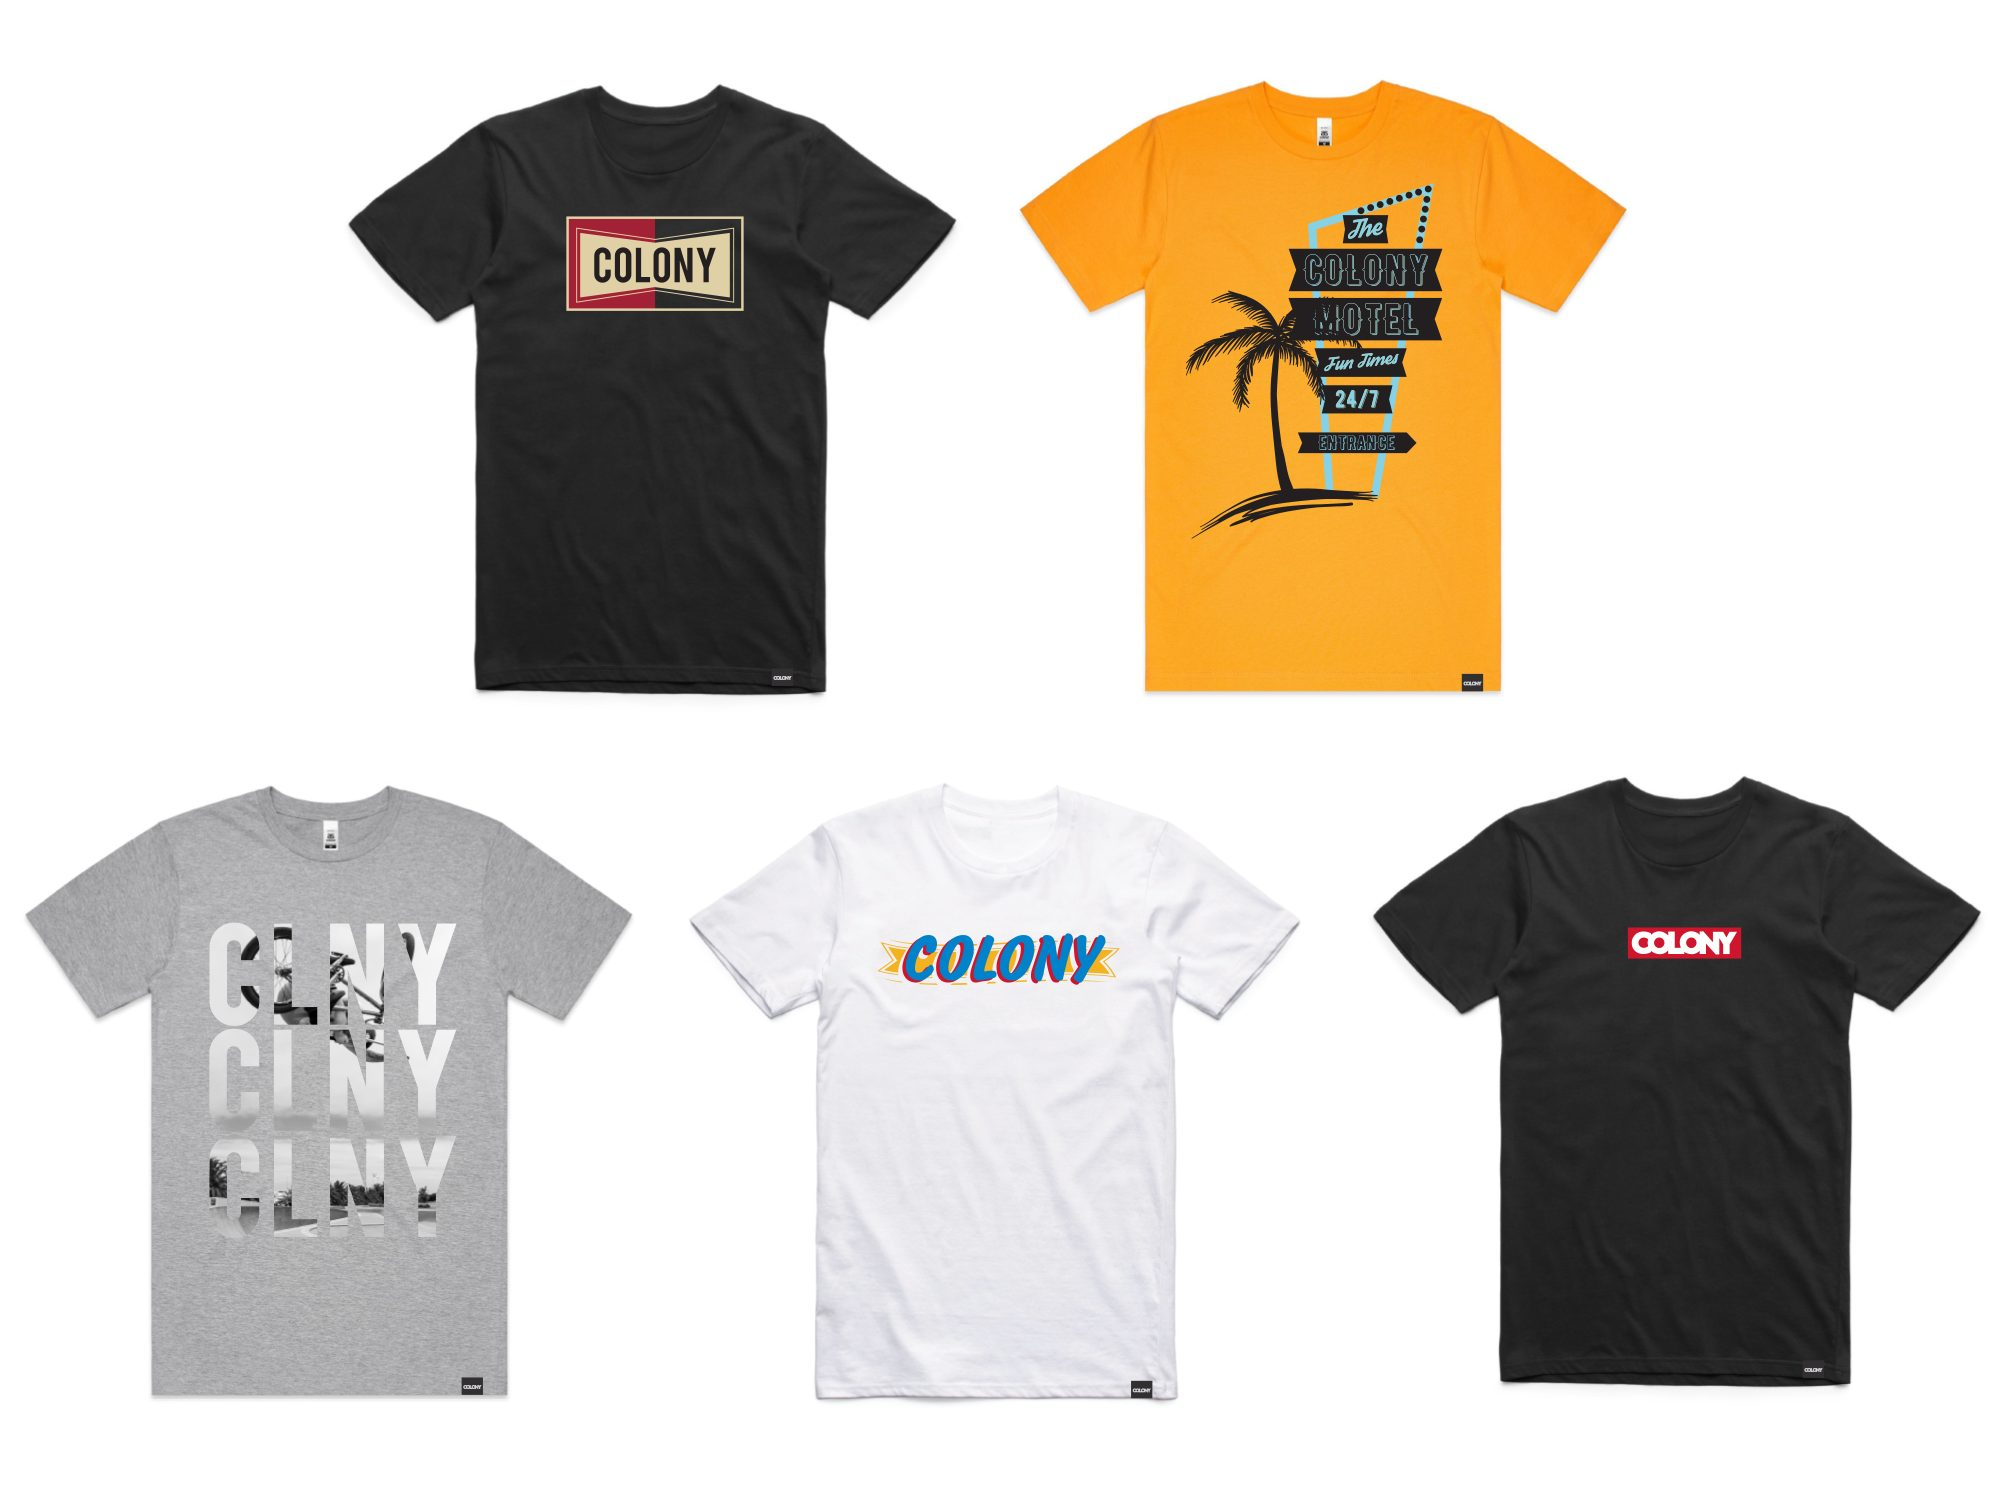 Colony BMX T-Shirts